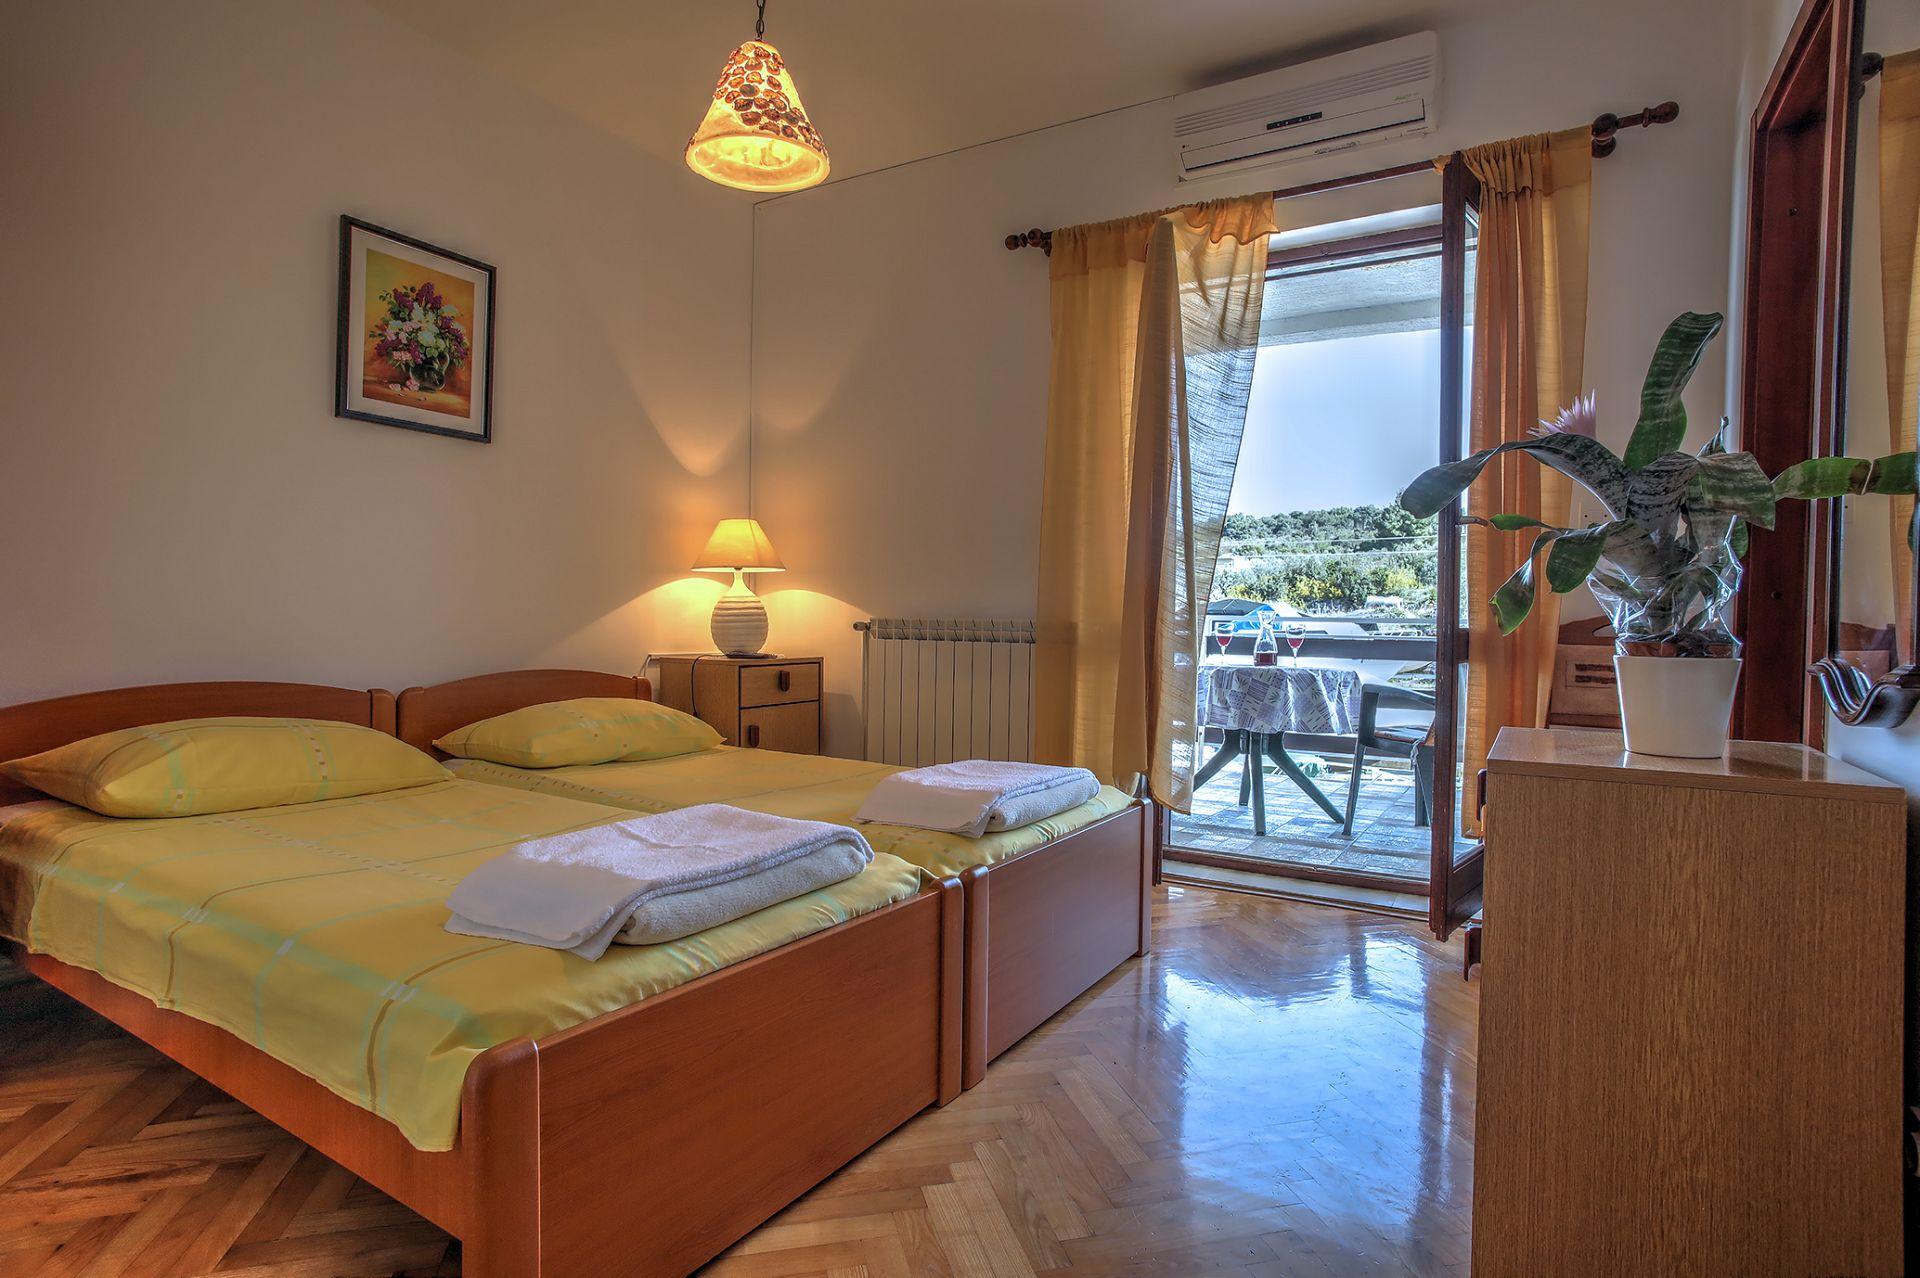 5409 - Jezera - Apartments Croatia - SA4(2): interior